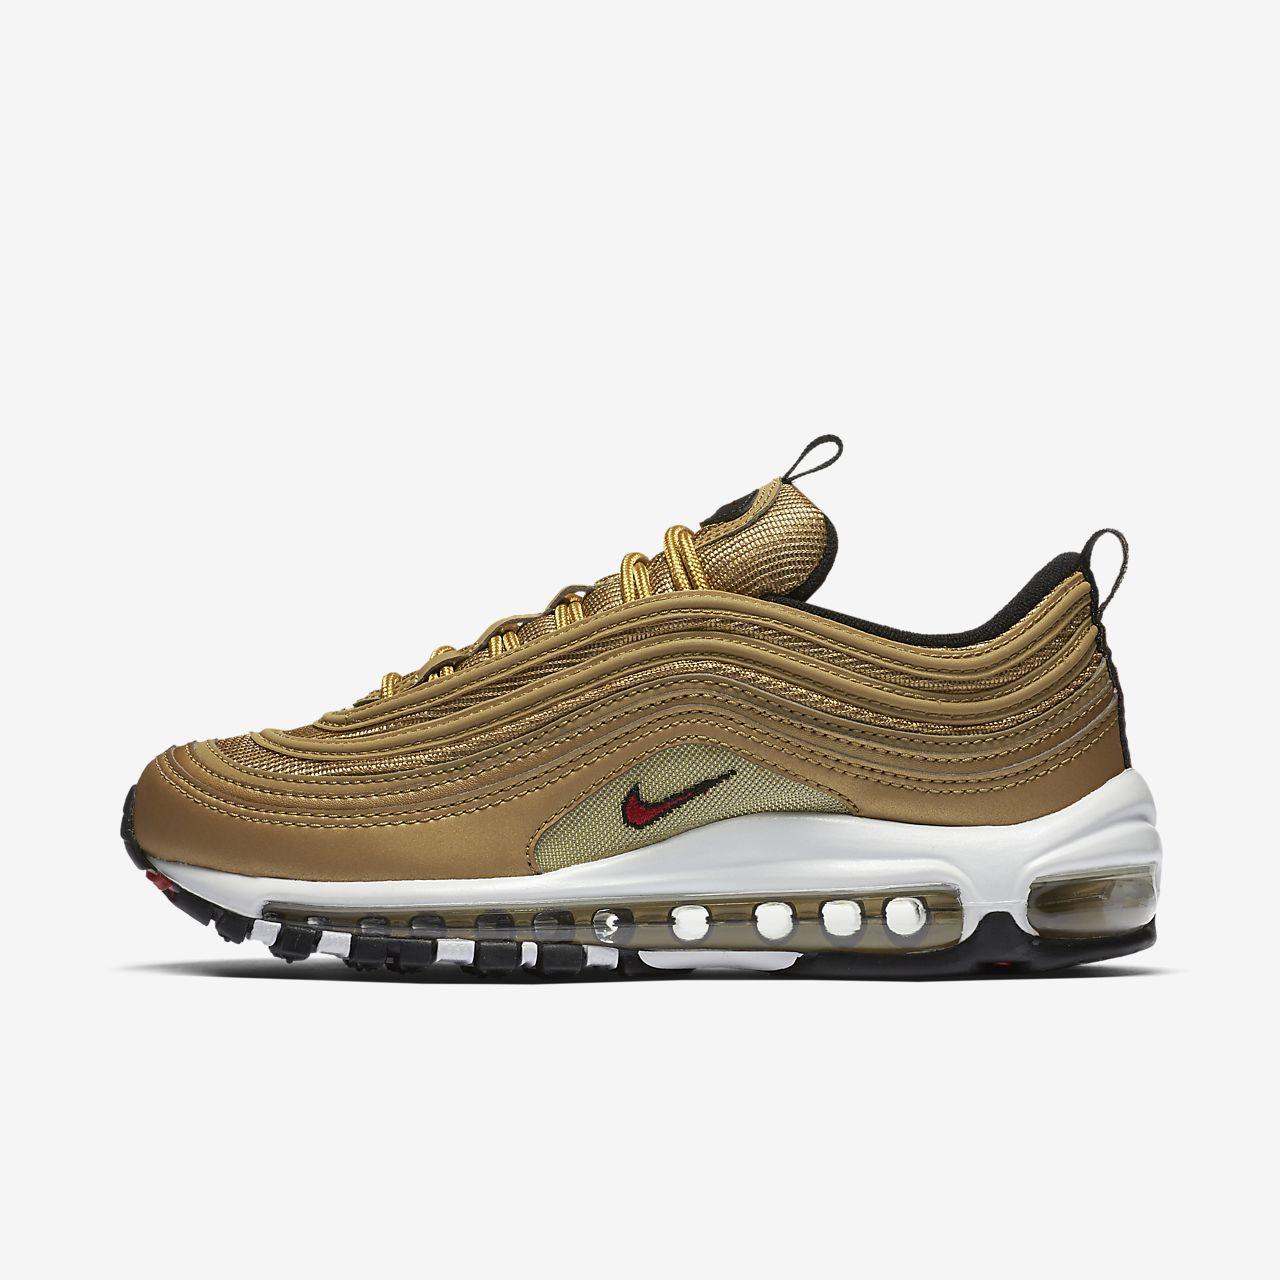 scarpe nike 97 donna